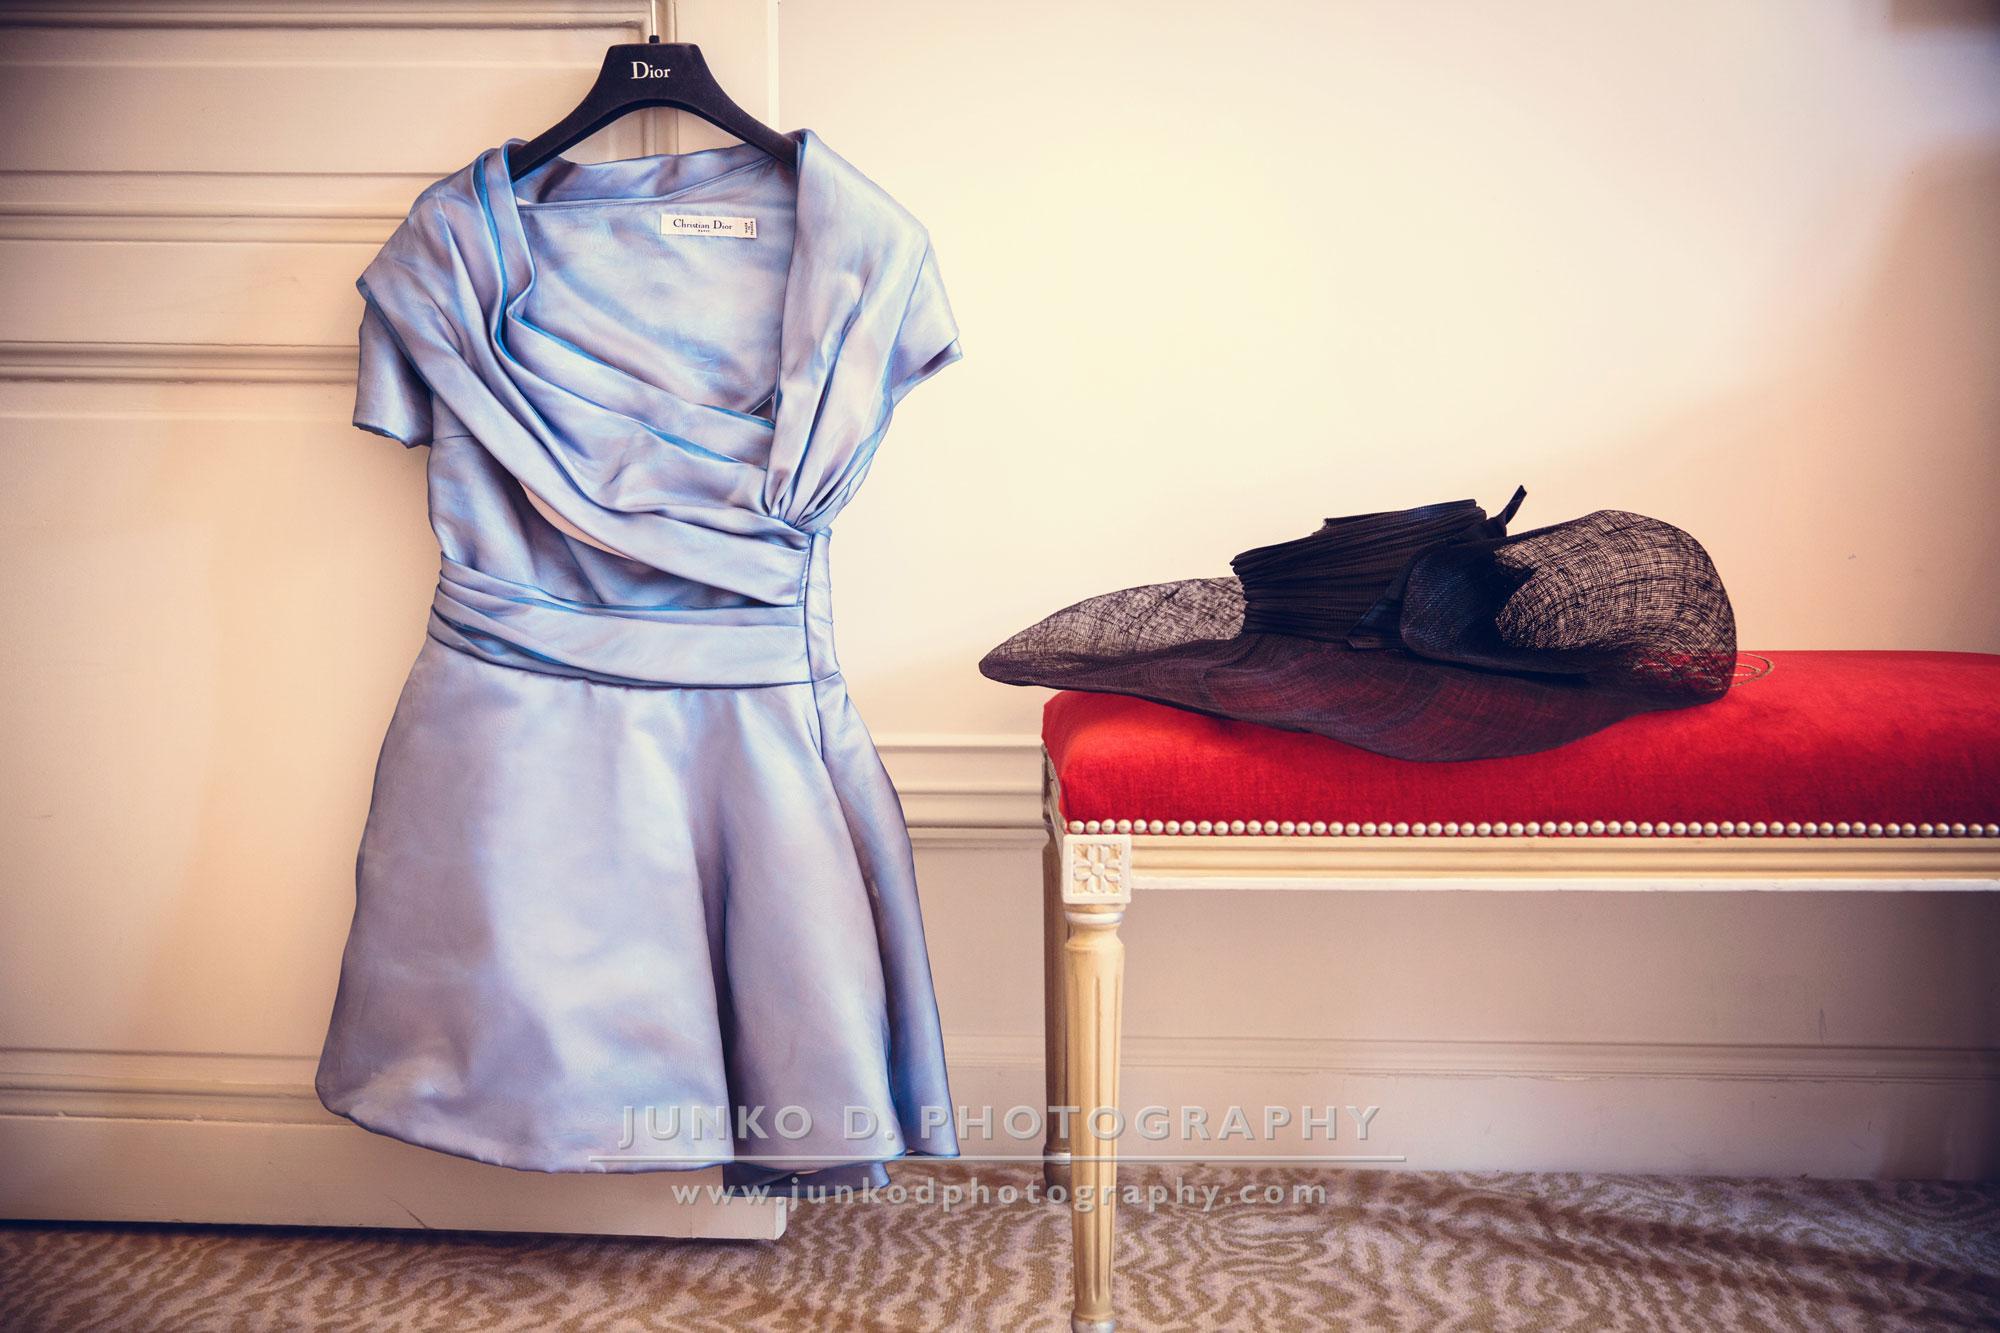 Dior dress in Plaza Atnénée decor